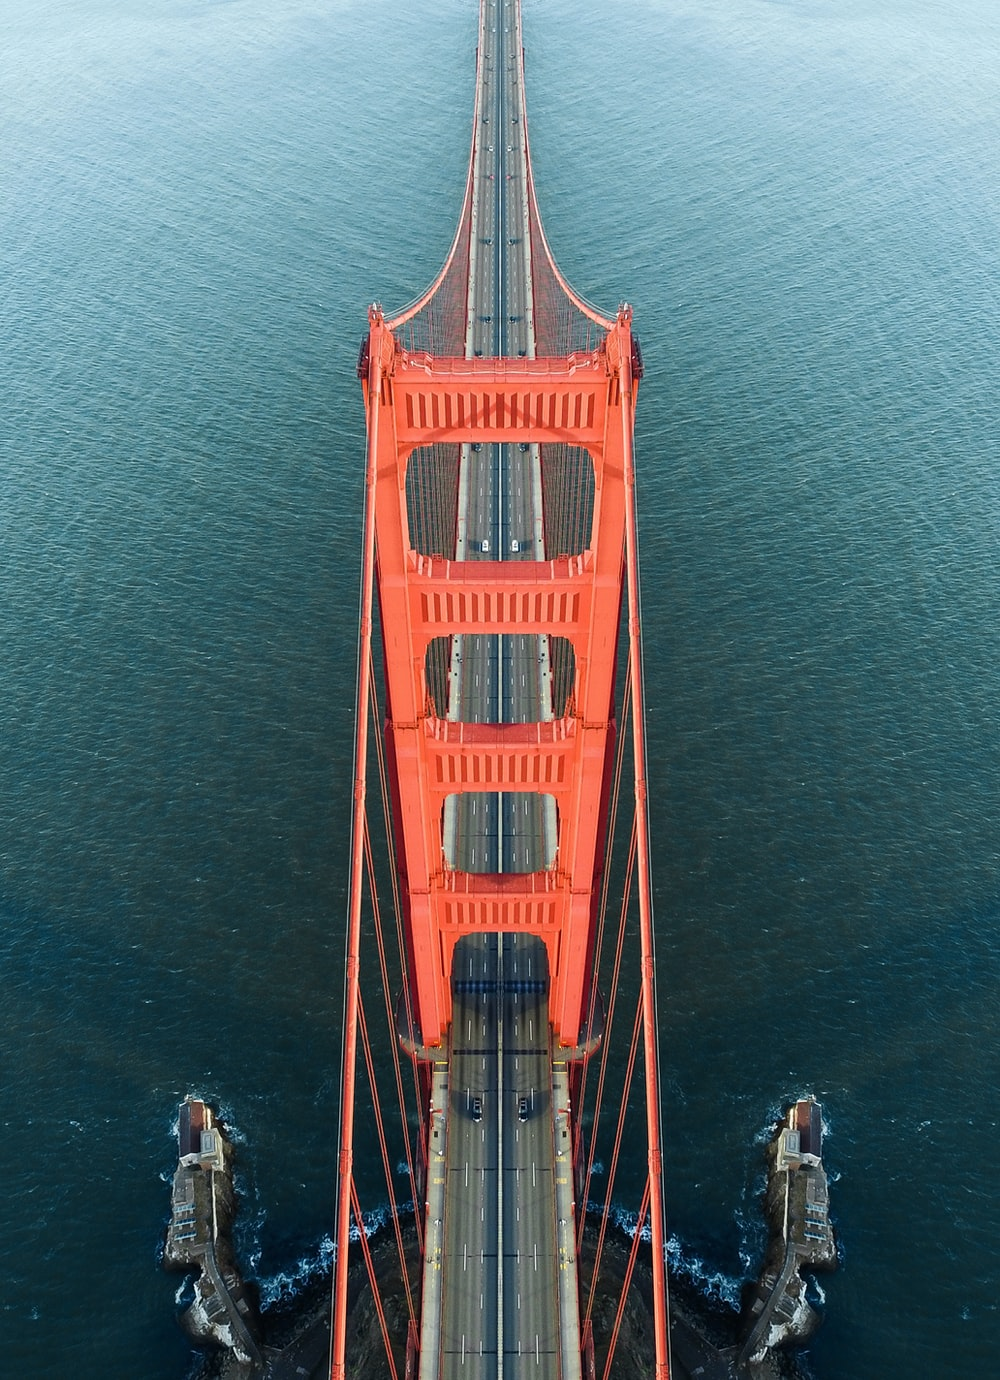 aerial photo of Golden Gate Bridge during daytime